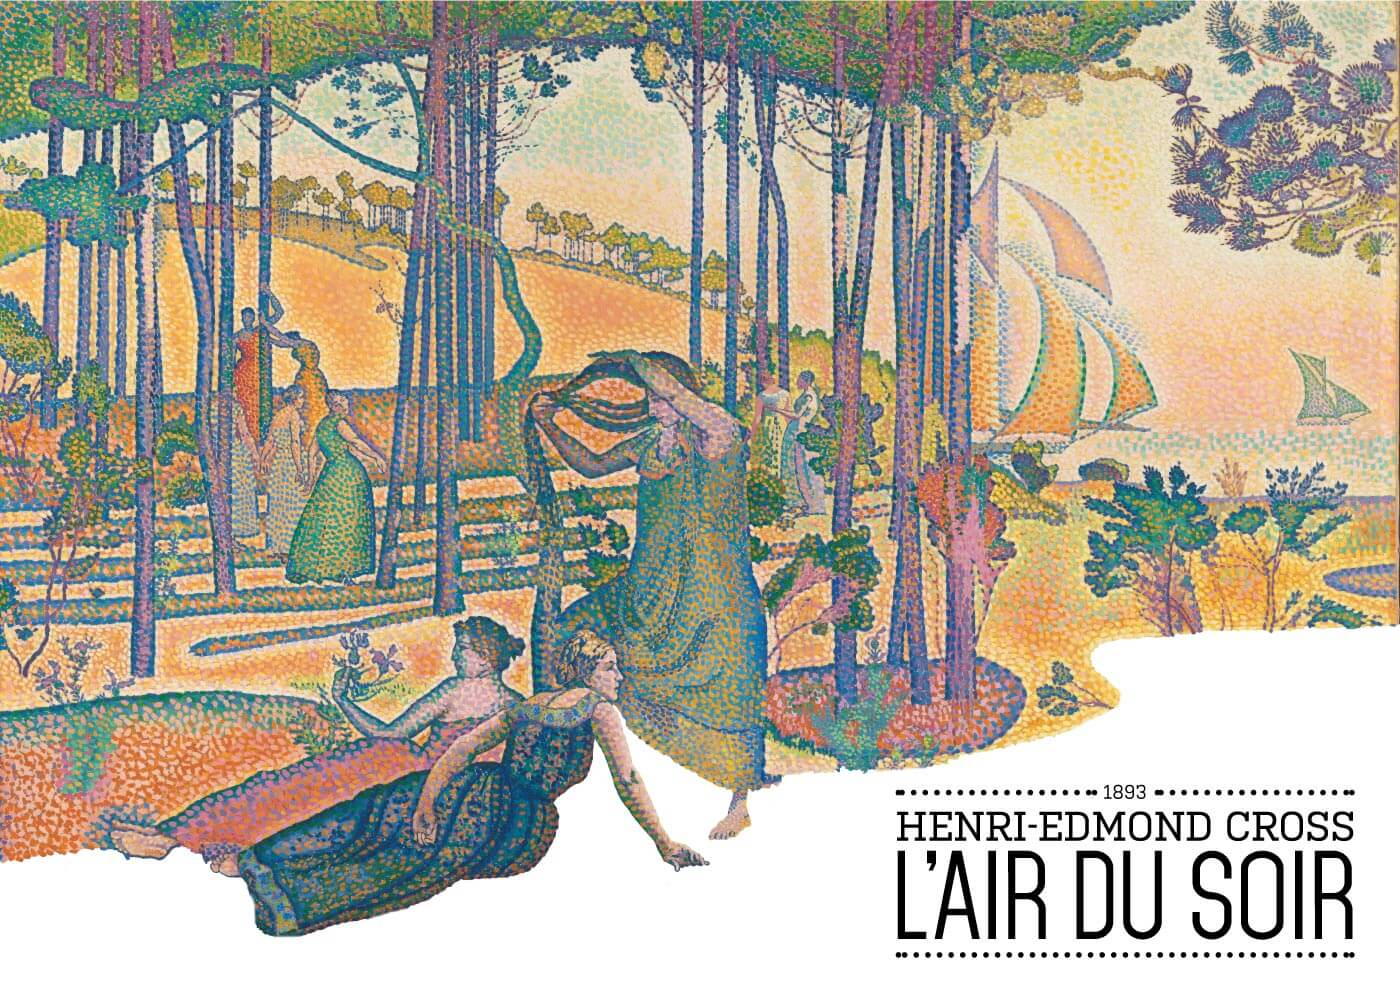 Billede af L'air du soir - Henri-Edmond Cross